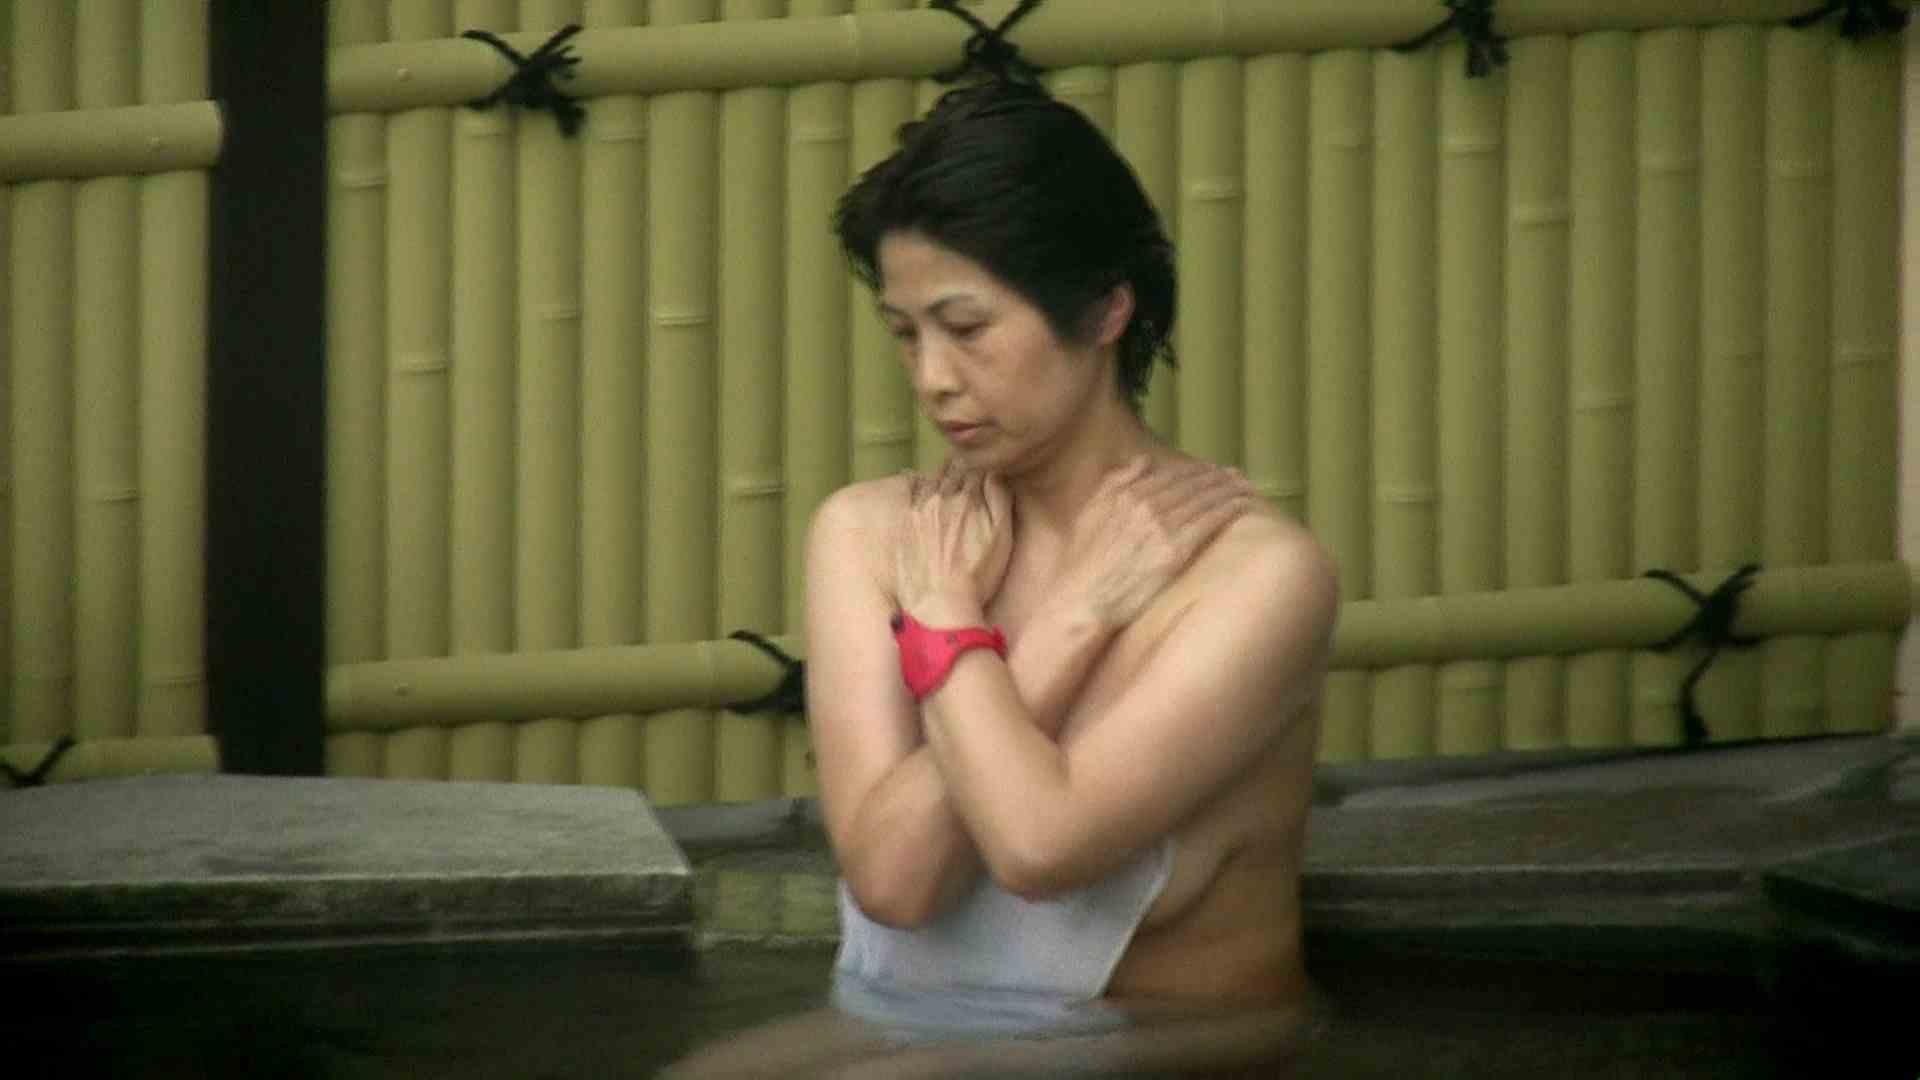 Aquaな露天風呂Vol.636 OL女体 | 露天  87連発 37